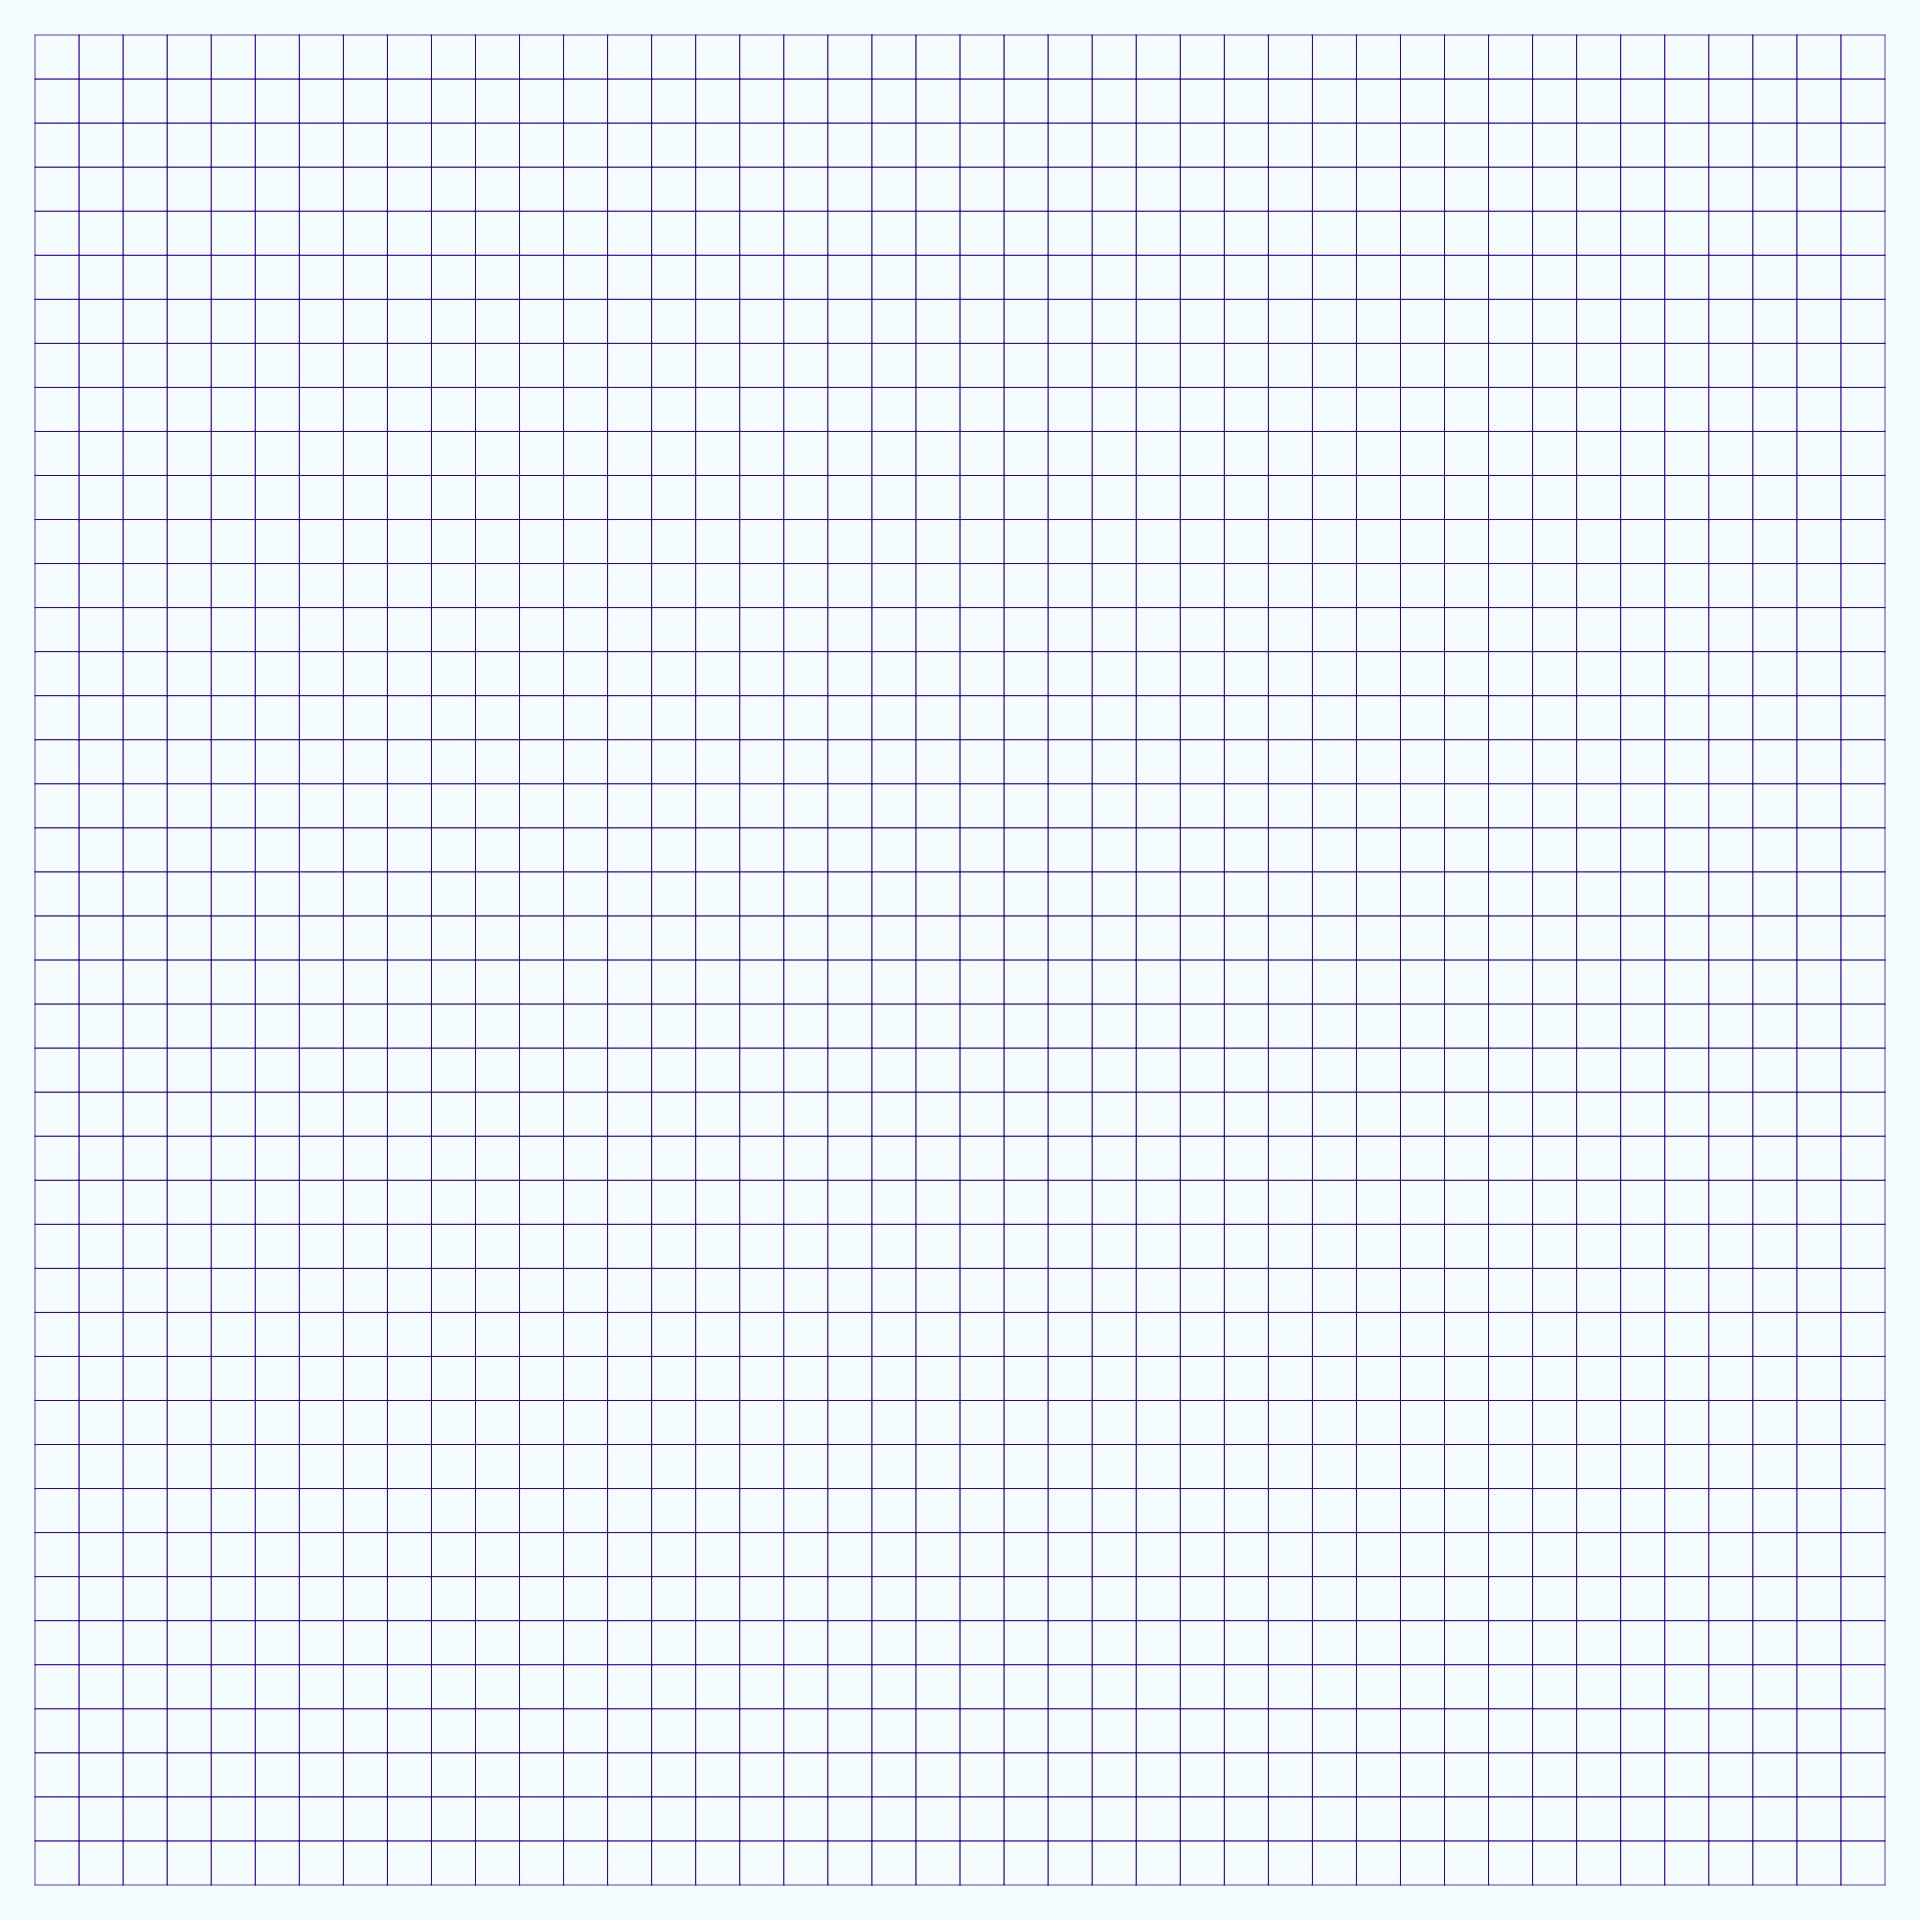 21 Best Printable Grid Paper - printablee.com Regarding Graph Paper Template For Word